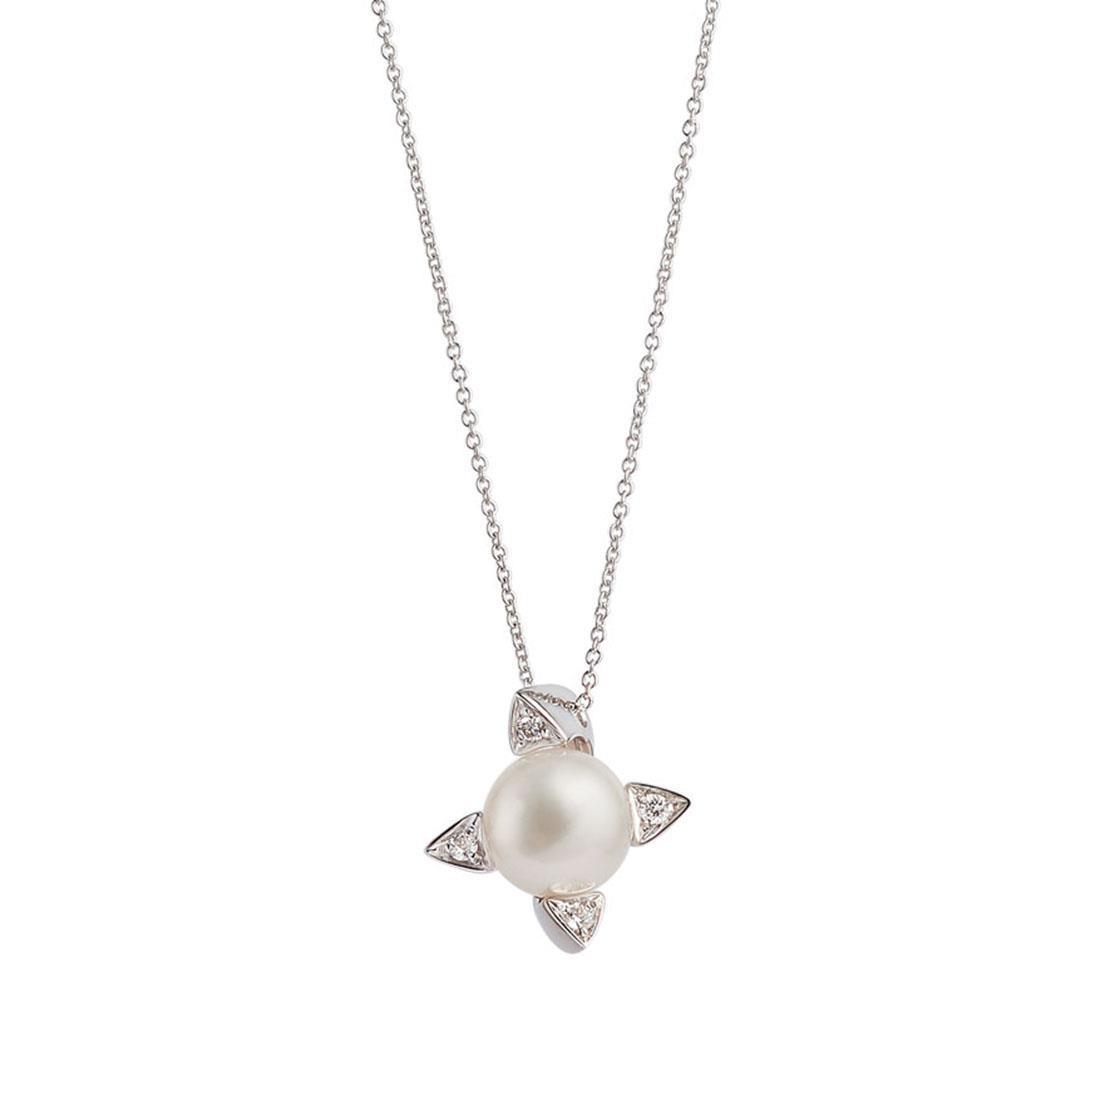 Collana con perla Akoya - ALFIERI & ST. JOHN